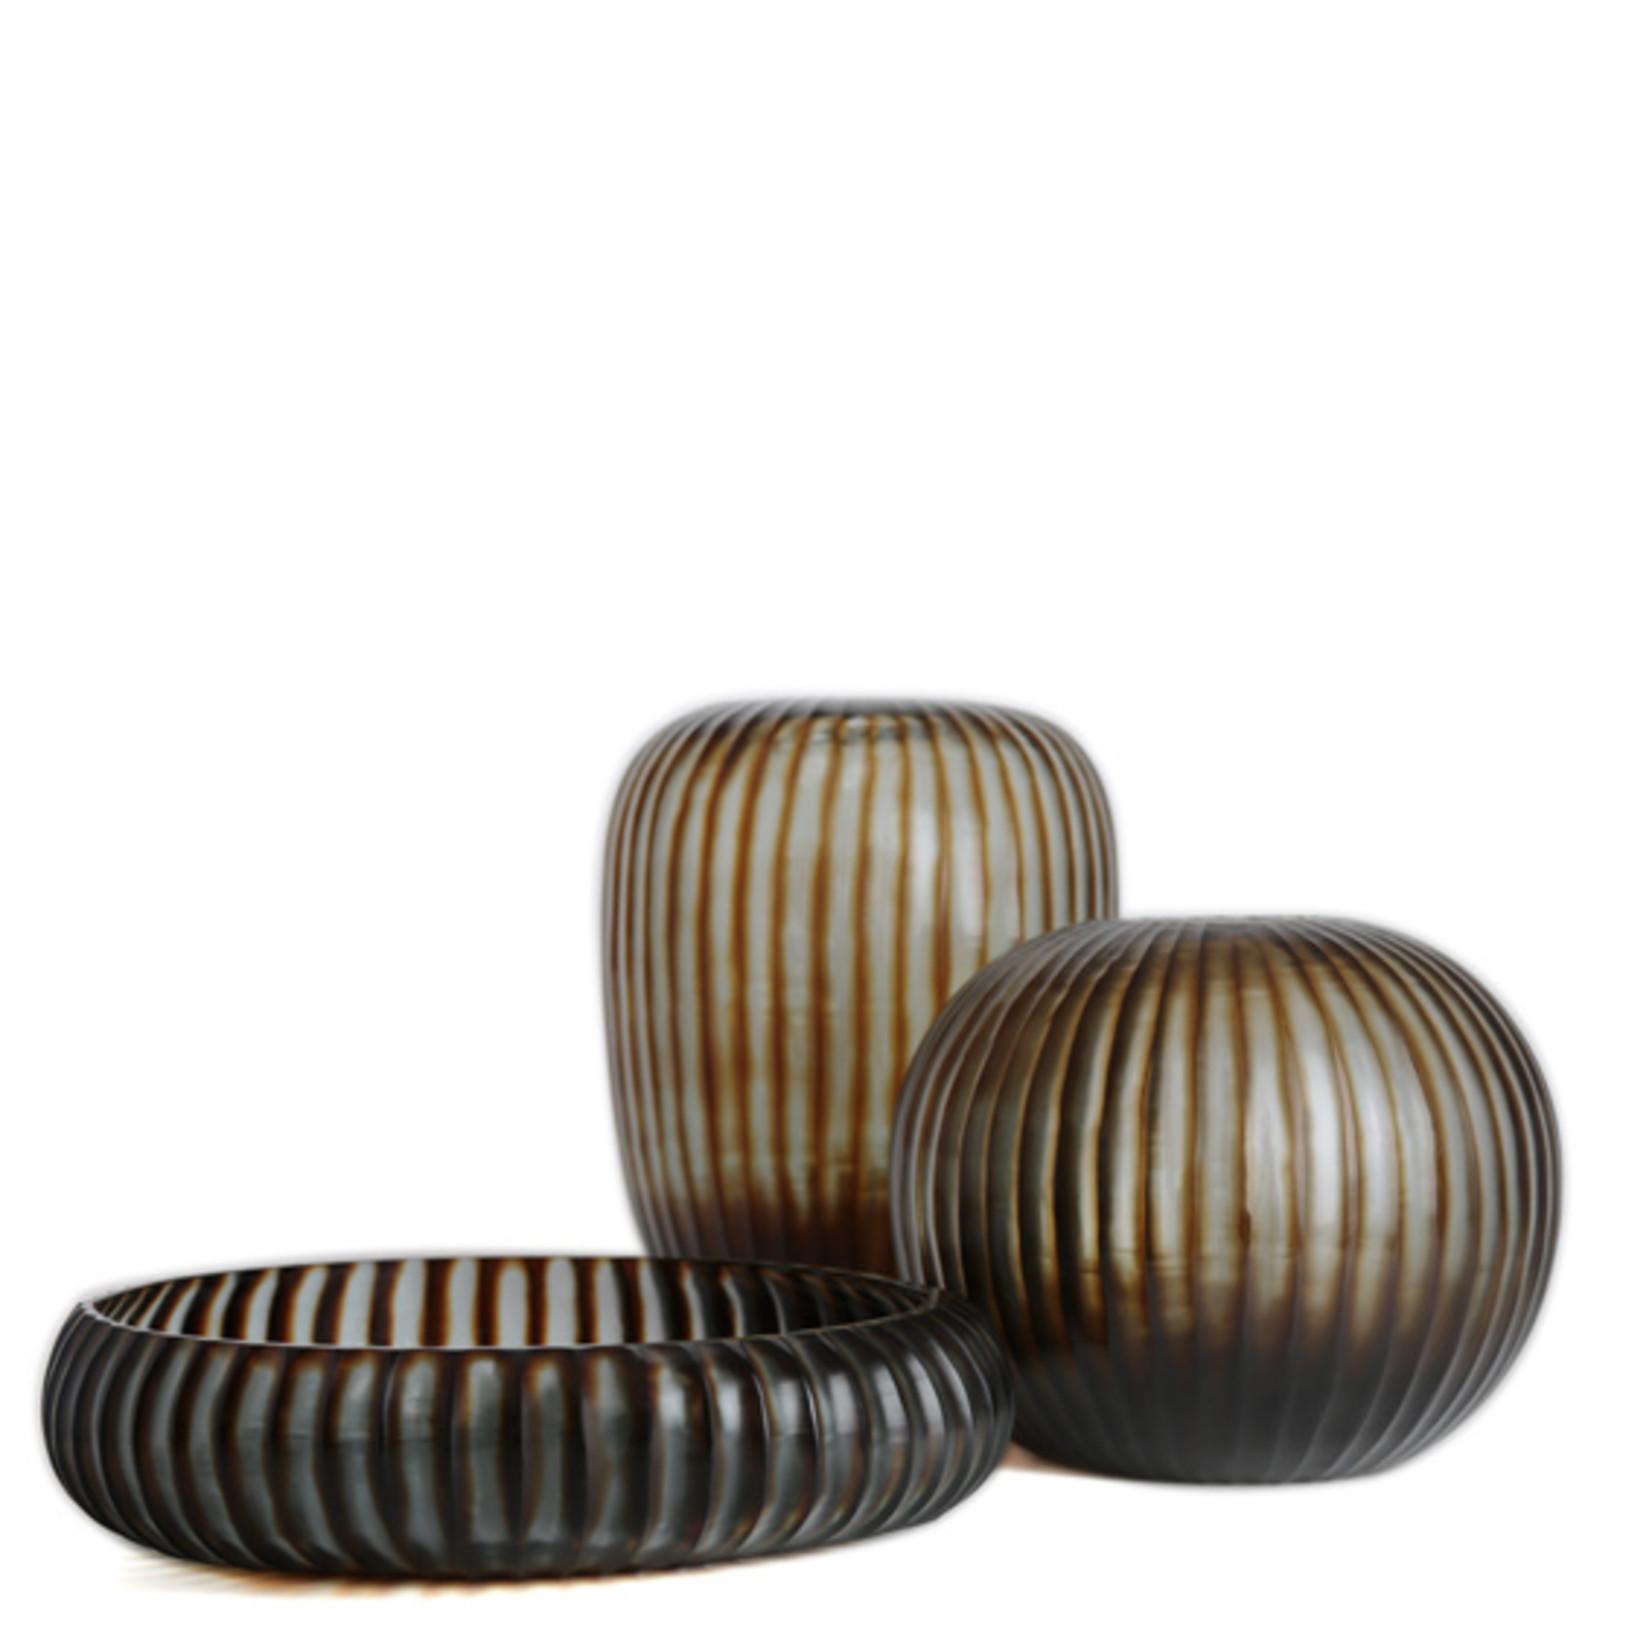 Guaxs Vase Gobi Round | Indigo / Brown